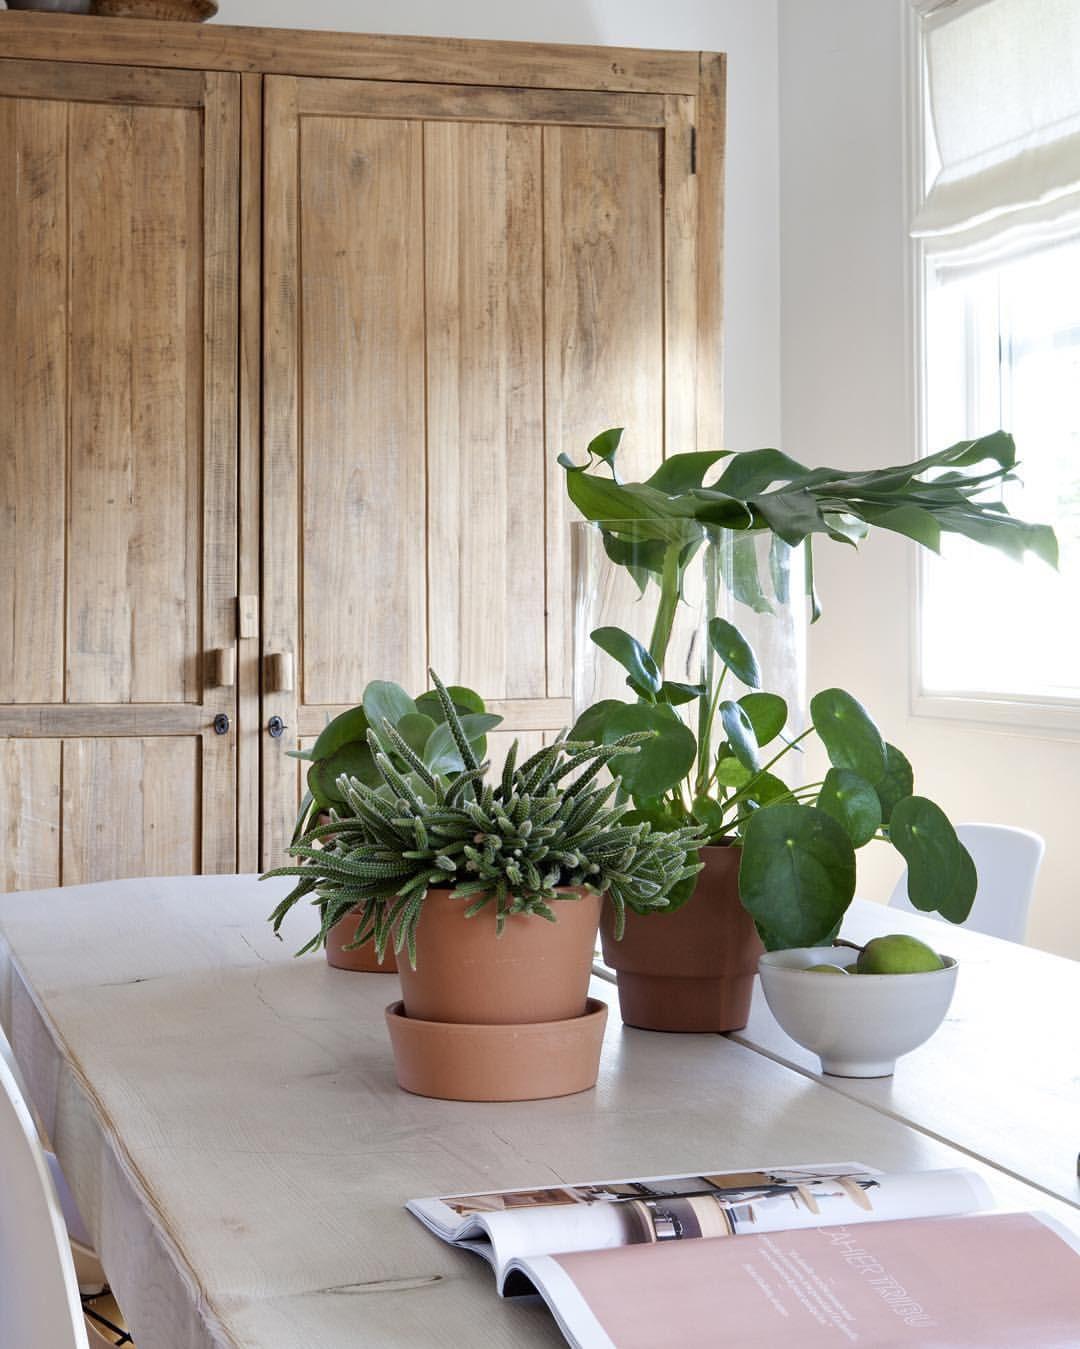 Enjoy the weekend everyone ... #weekend #homesweethome #organichome #greenplants #livingwithplants #trend #scandinaviandesign #scandinavianliving #bobedrenorge @bobedrenorge @2athomeblogg